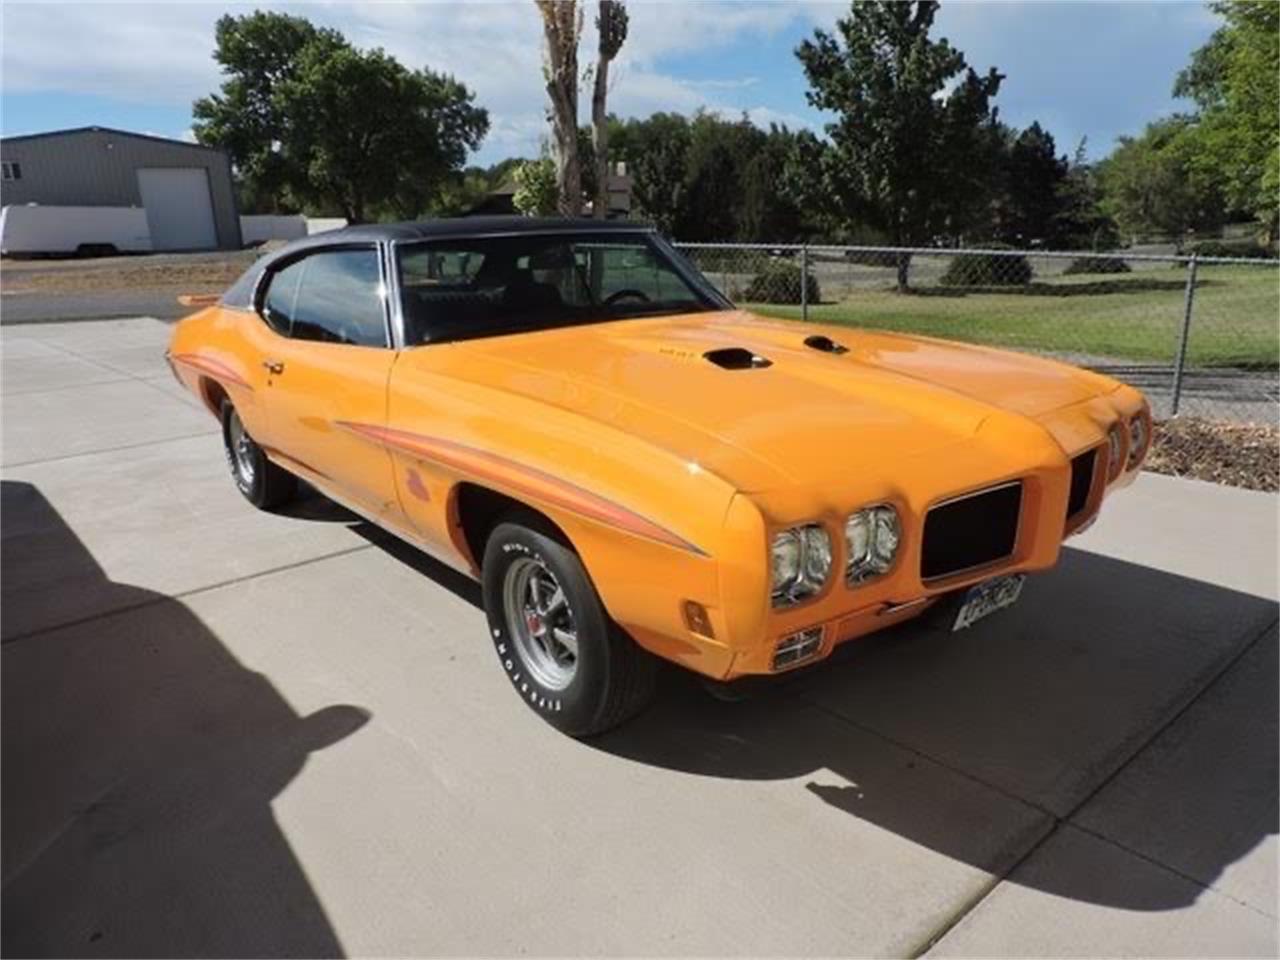 1970 Pontiac GTO (The Judge) (CC-1384852) for sale in Scottsdale, Arizona